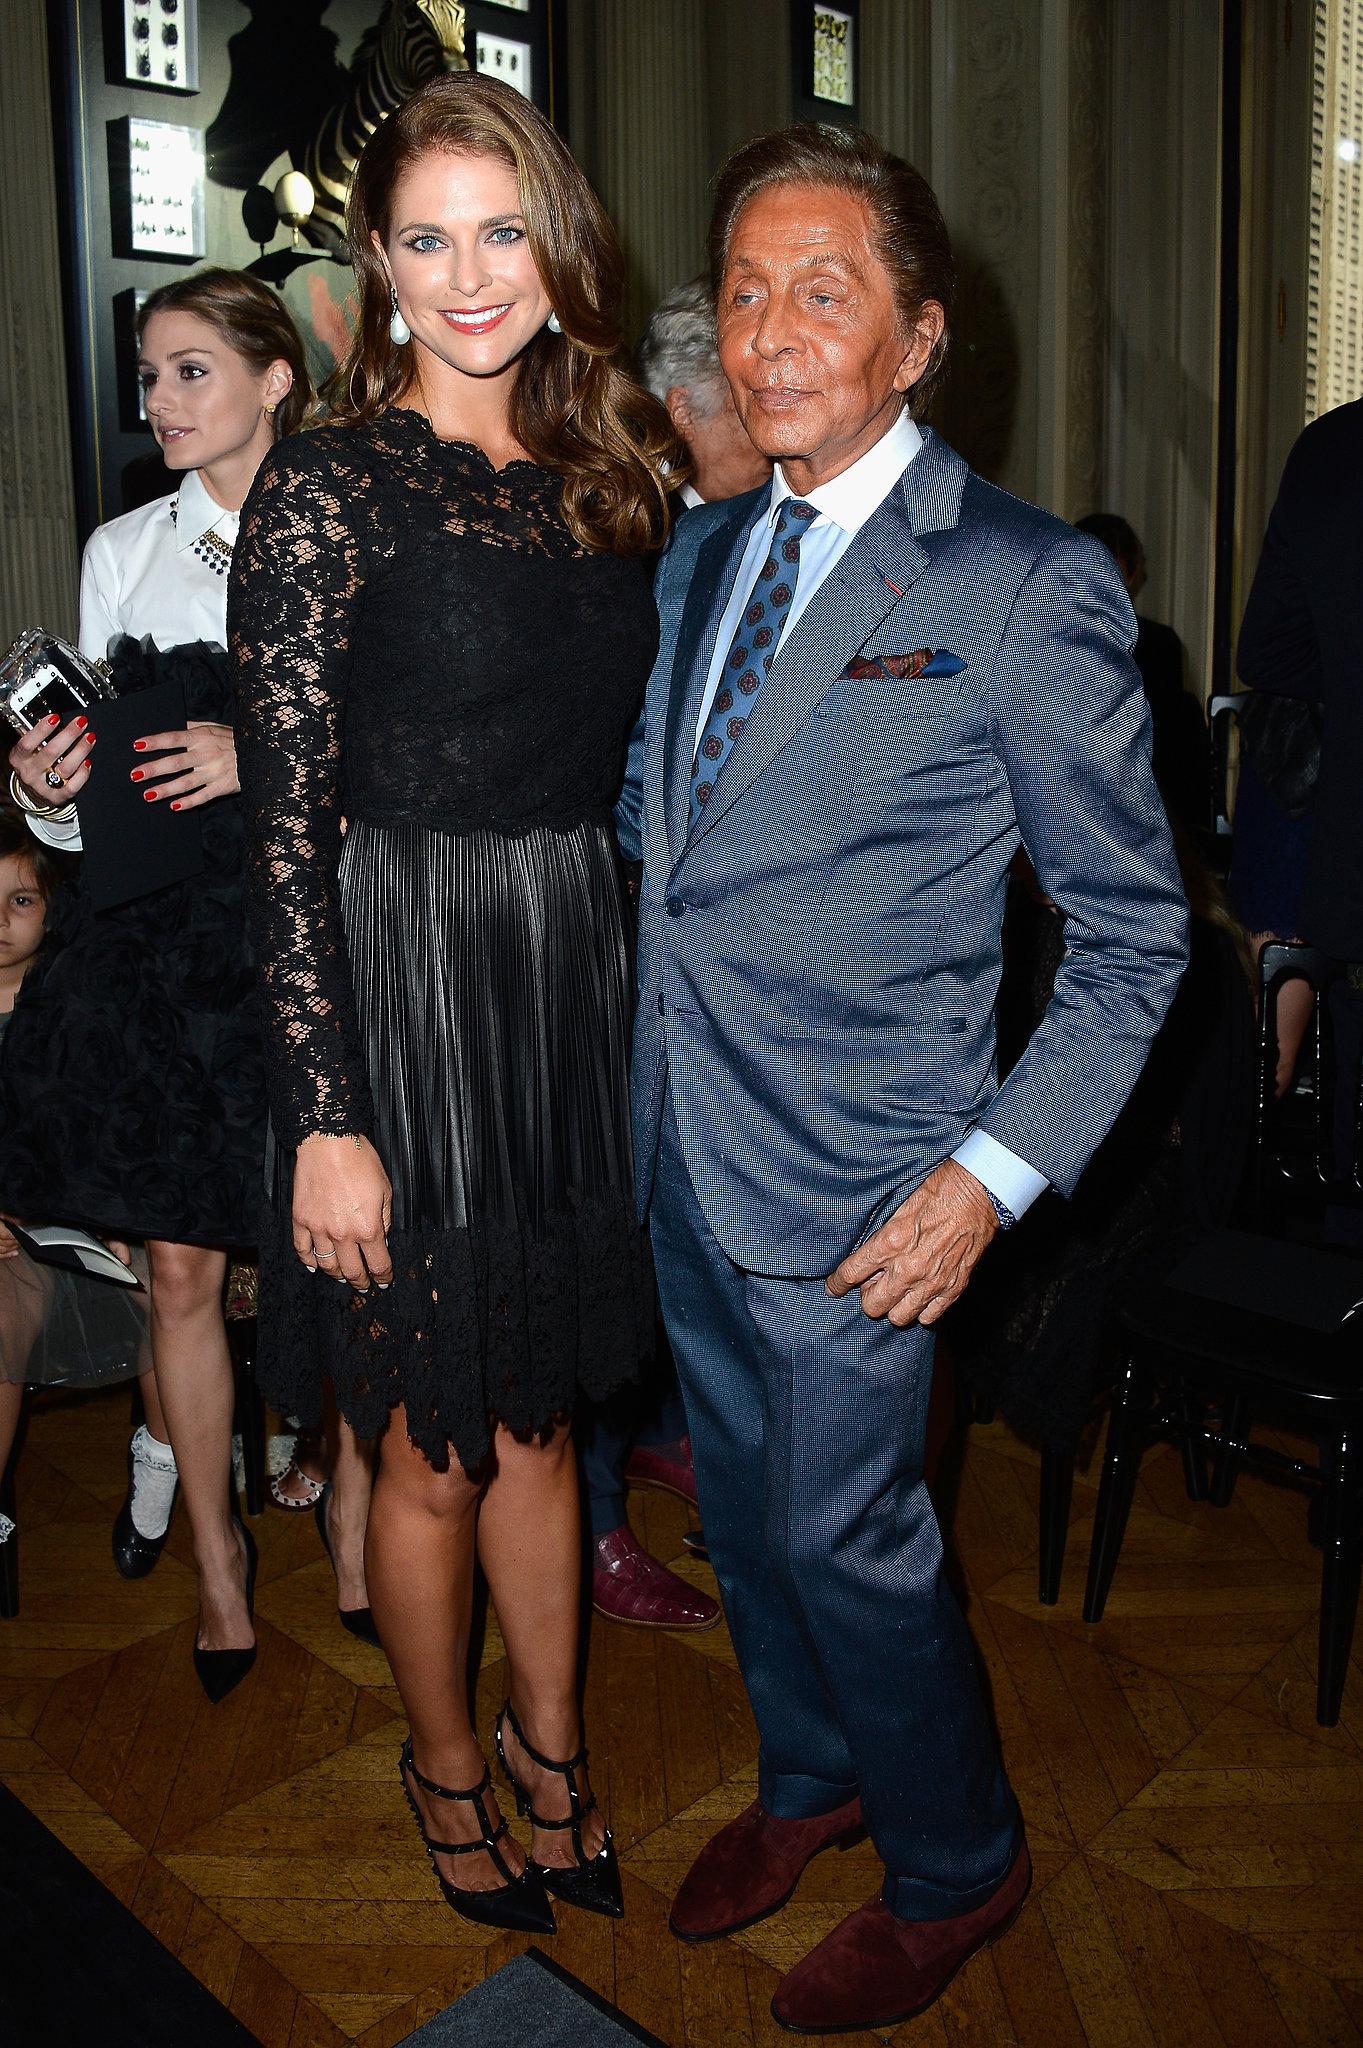 Valentino Garavani got the royal treatment from Prin